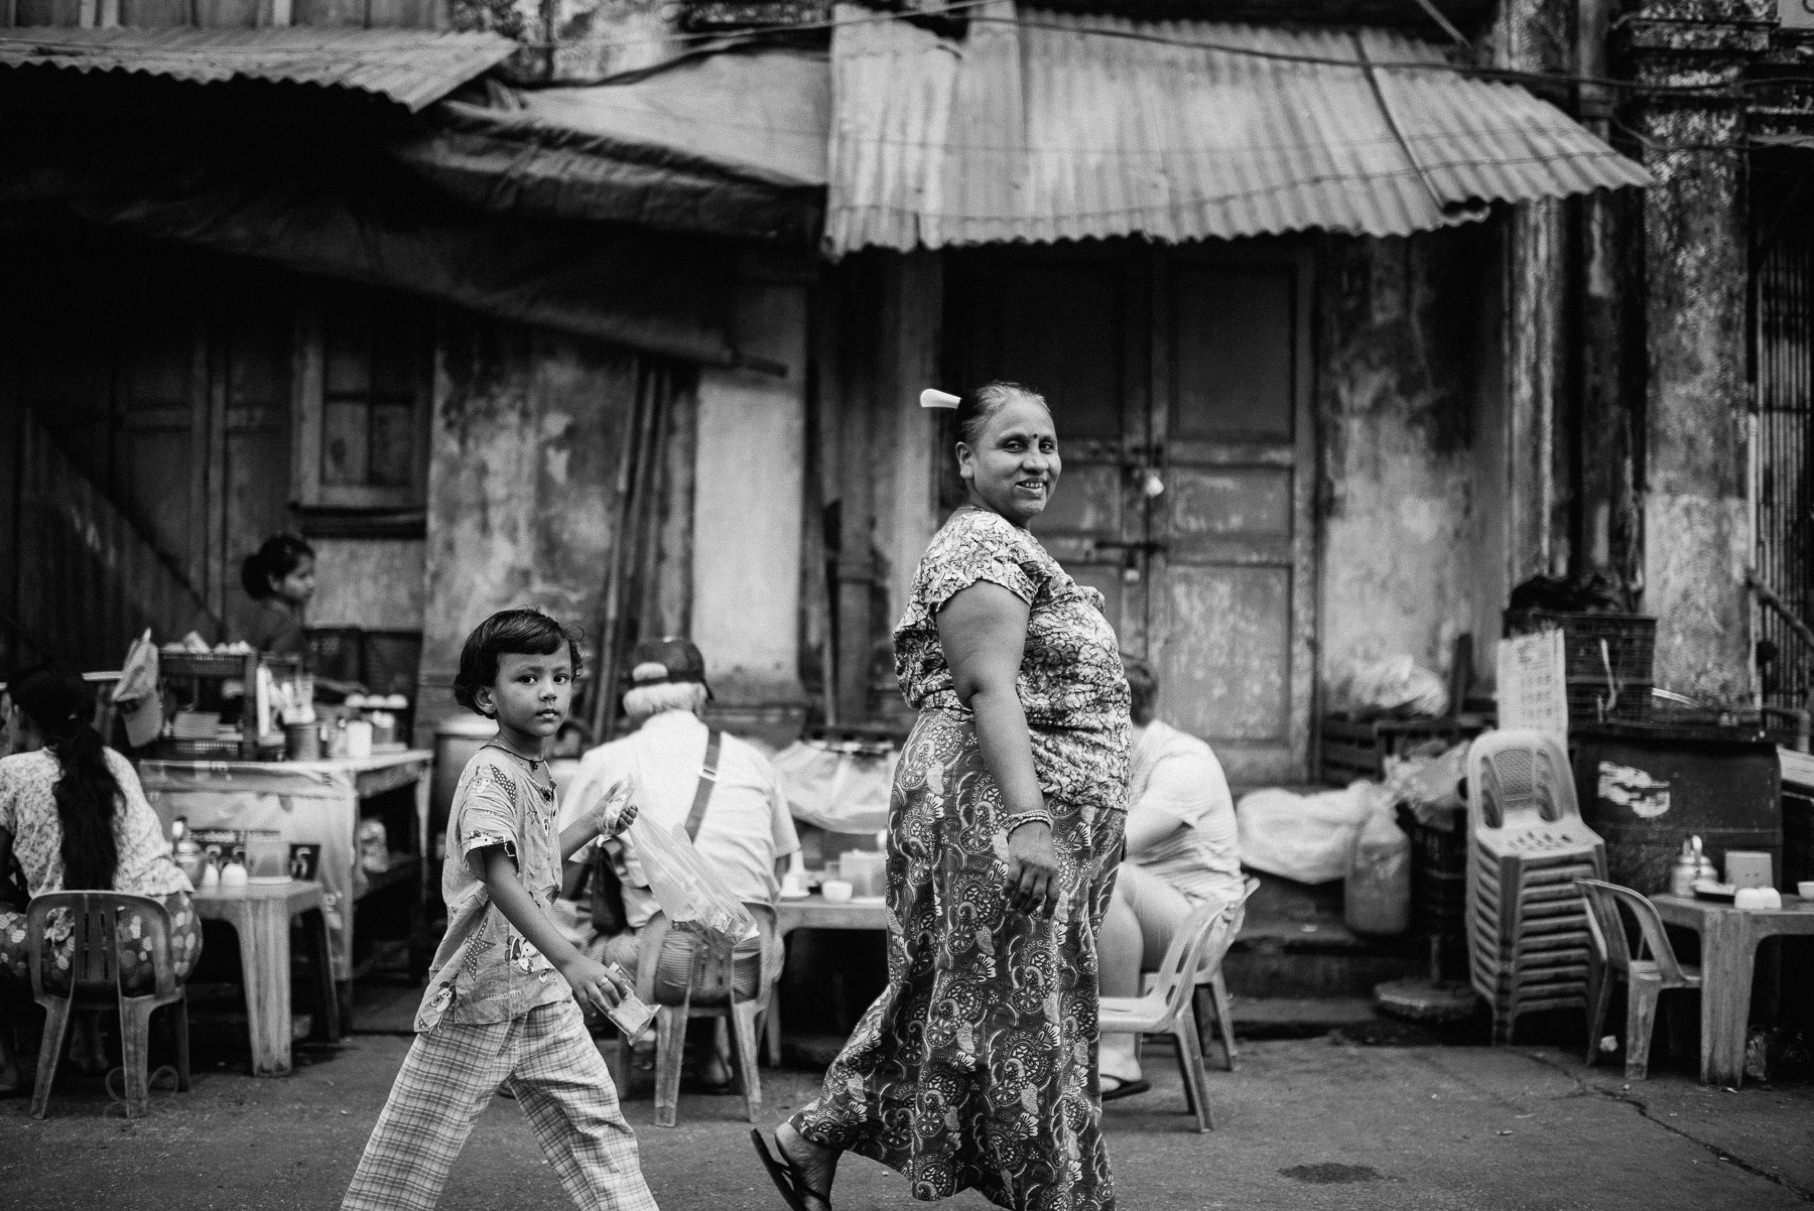 0010 yangon mandalay d76 4295 - Großstädte Myanmars - Yangon & Mandalay